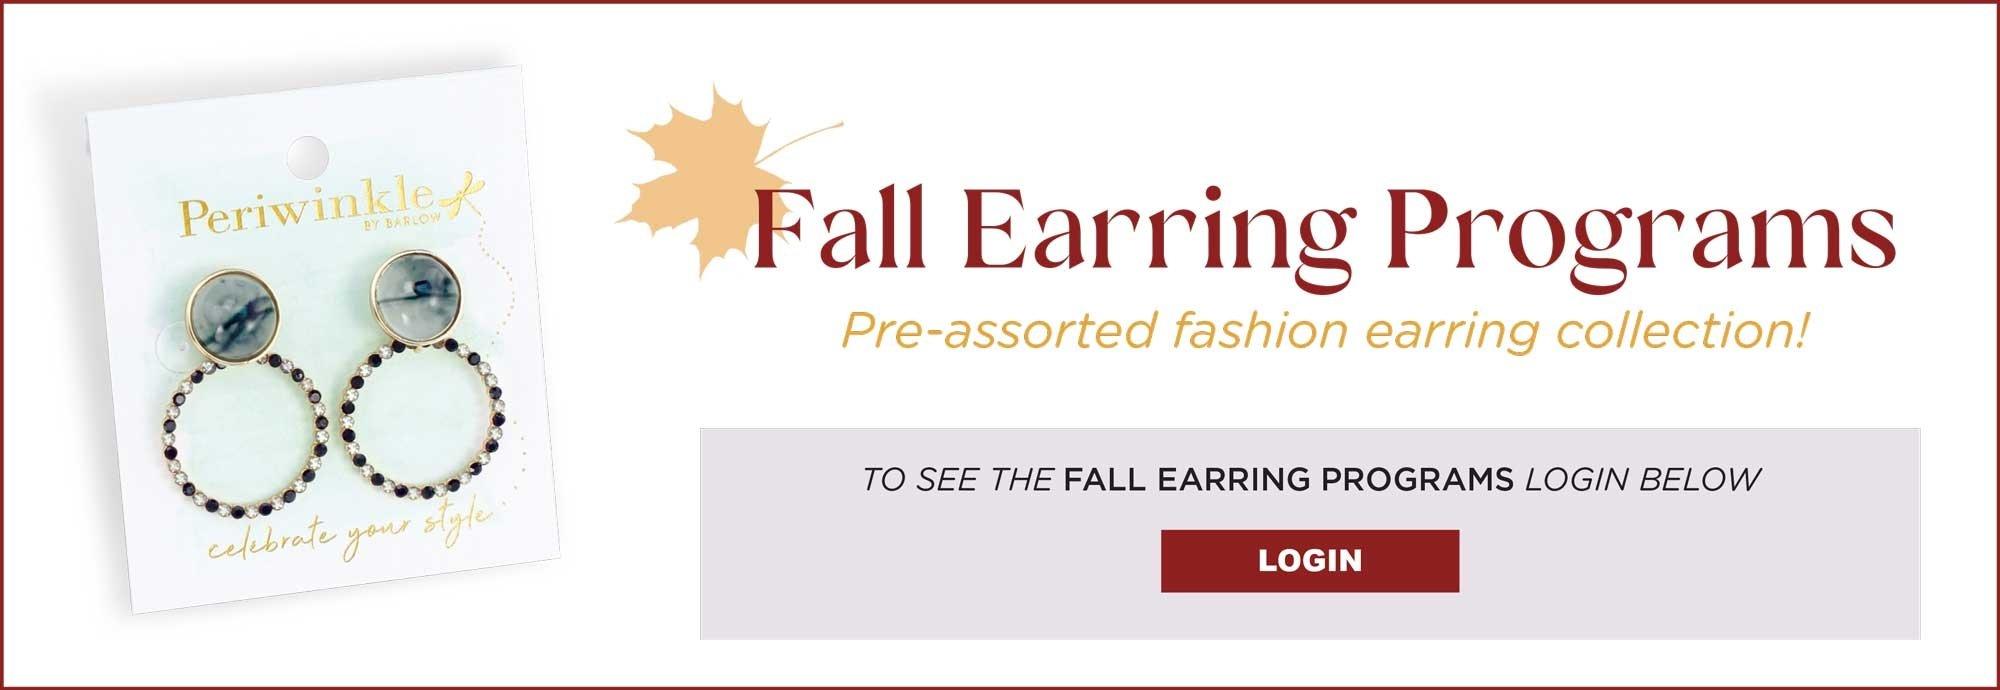 FALL EARRING PROGRAMS